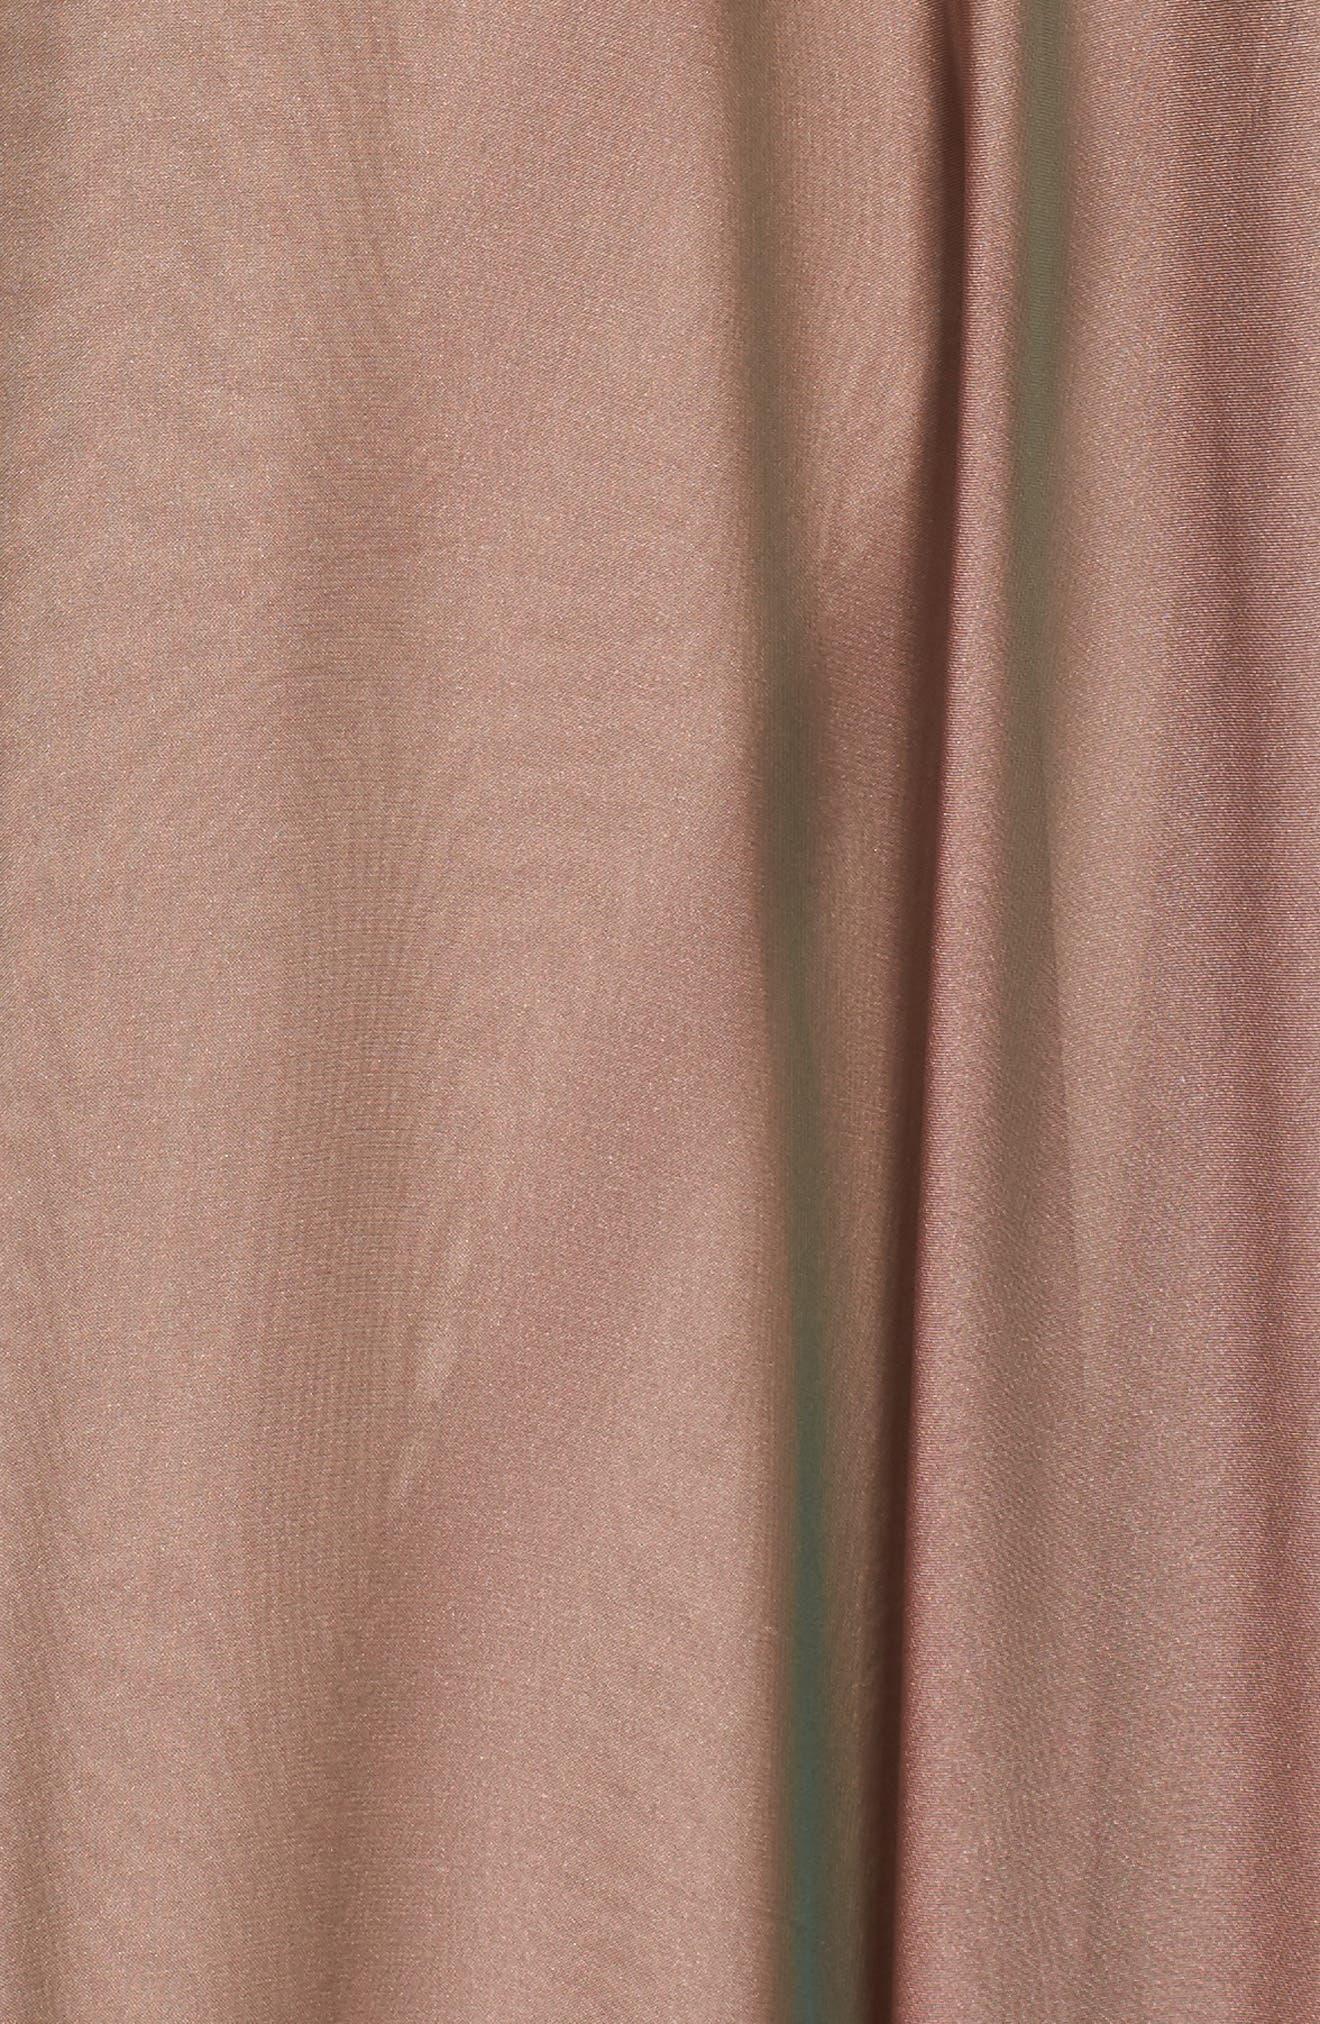 LA FEMME, Embellished Bodice Gown, Alternate thumbnail 5, color, COCOA